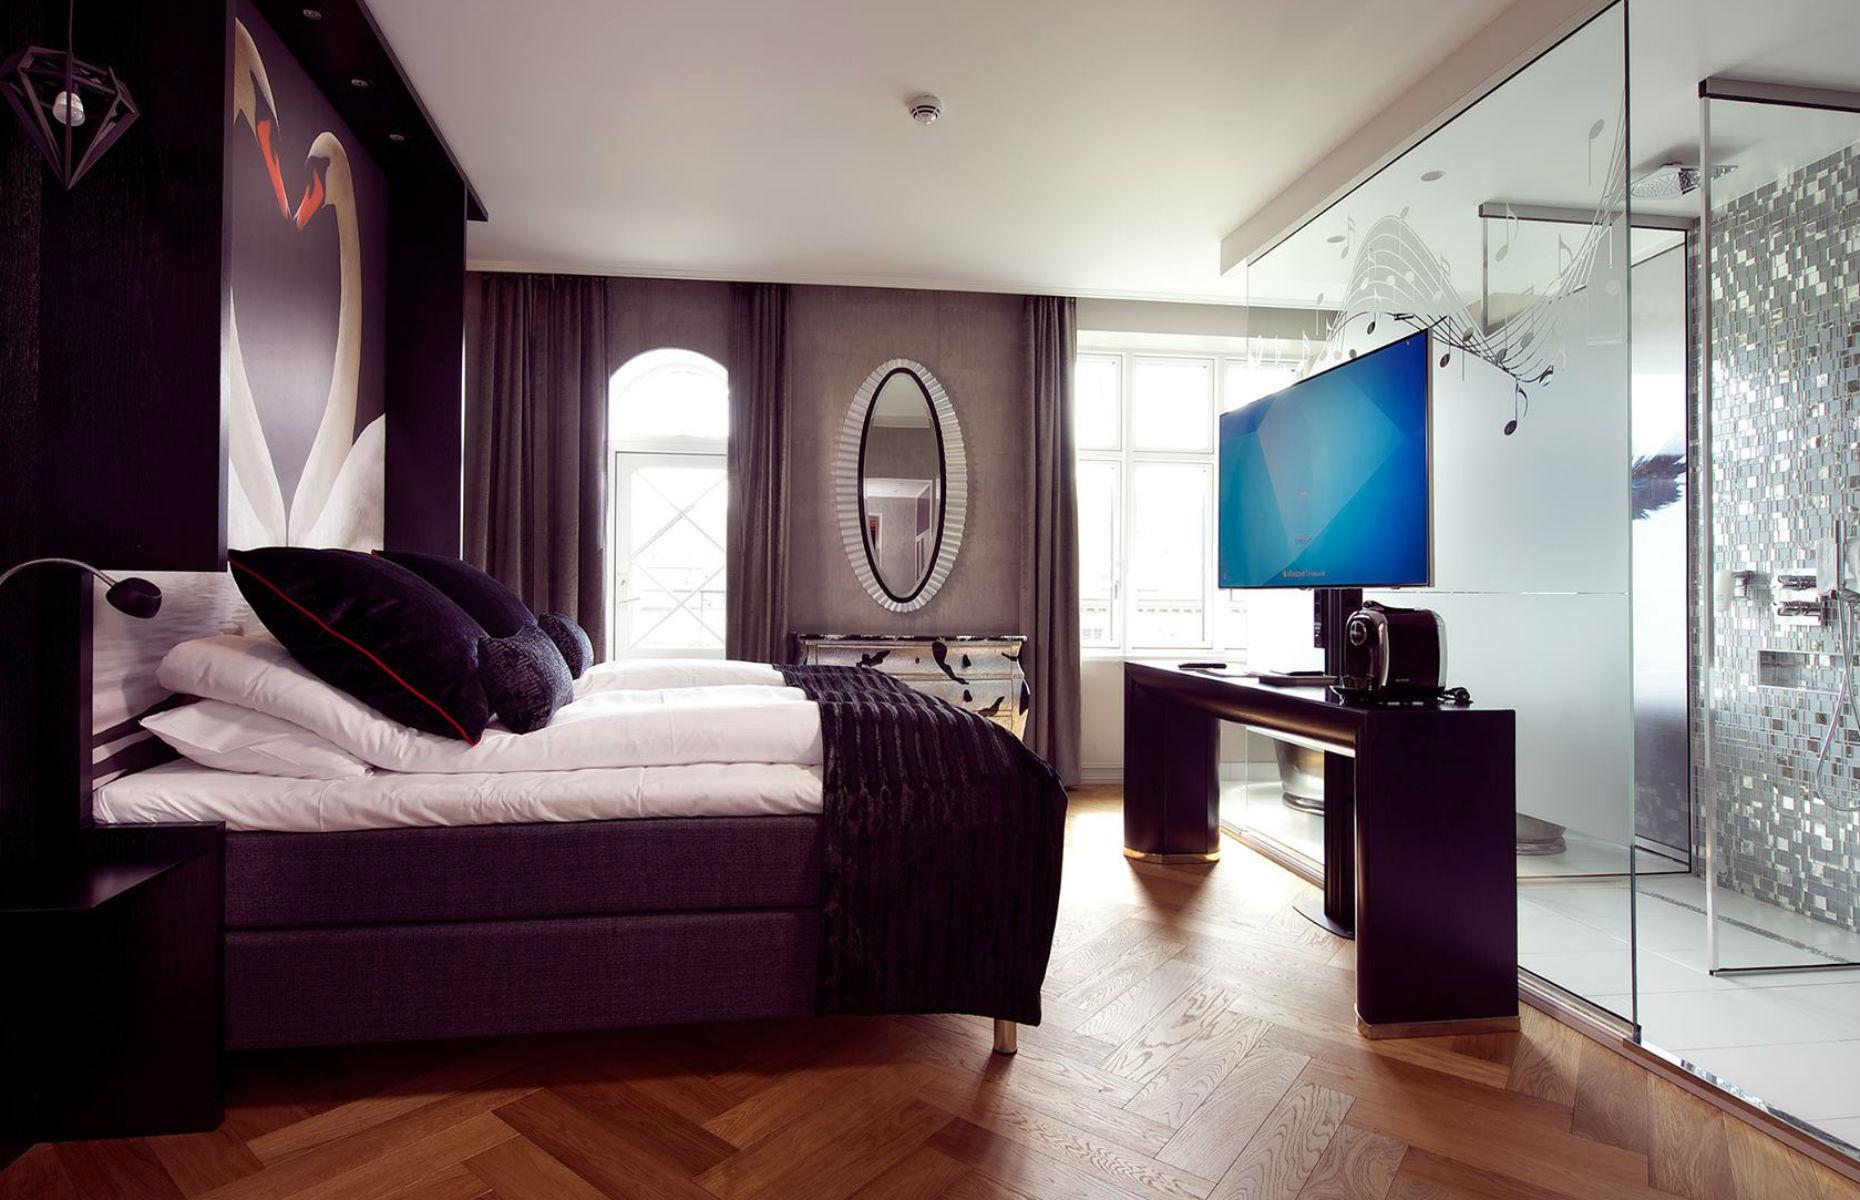 A bedroom in Hotel Oleana Bergen Norway (Image: Hotel Oleana/Facebook)